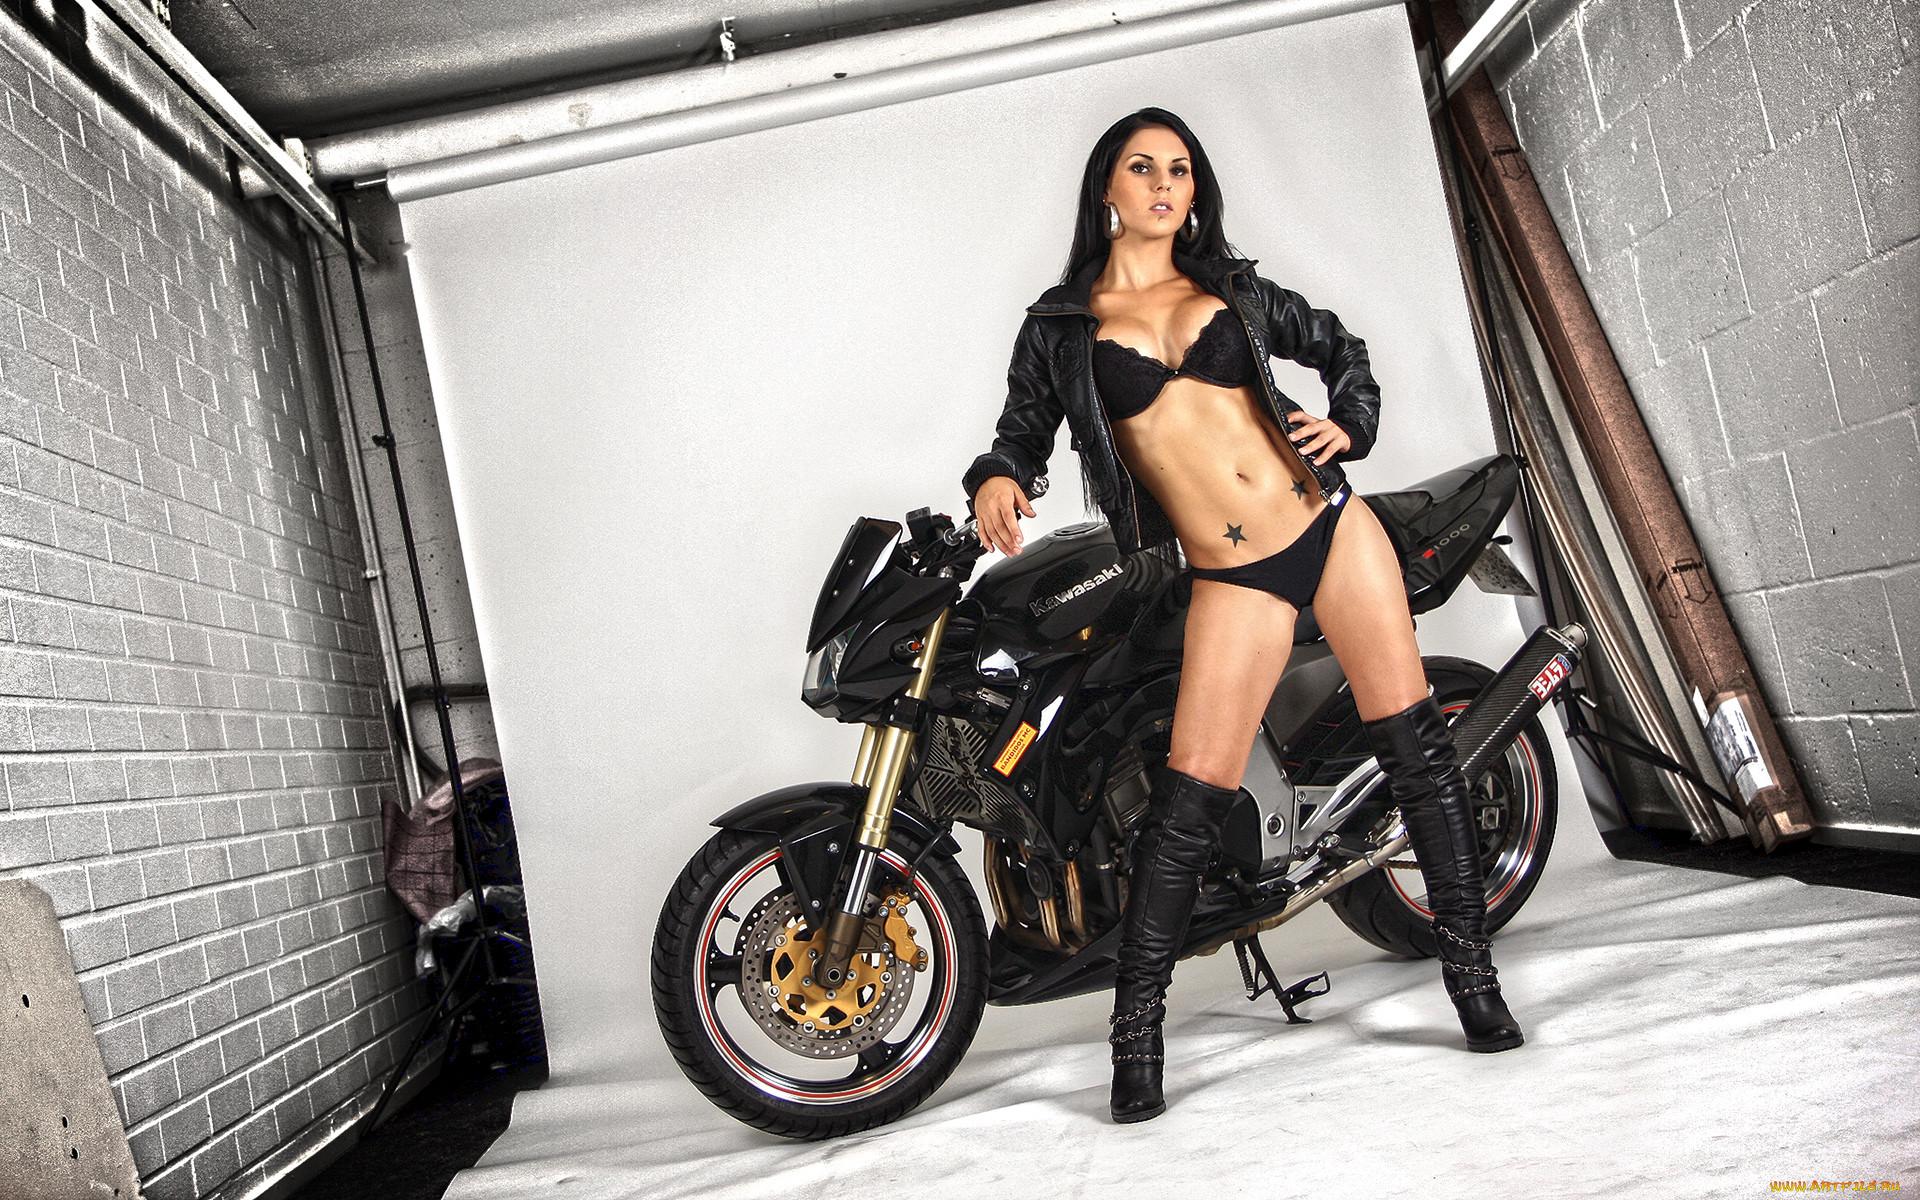 мотоциклы, мото, девушкой, тату, куртка